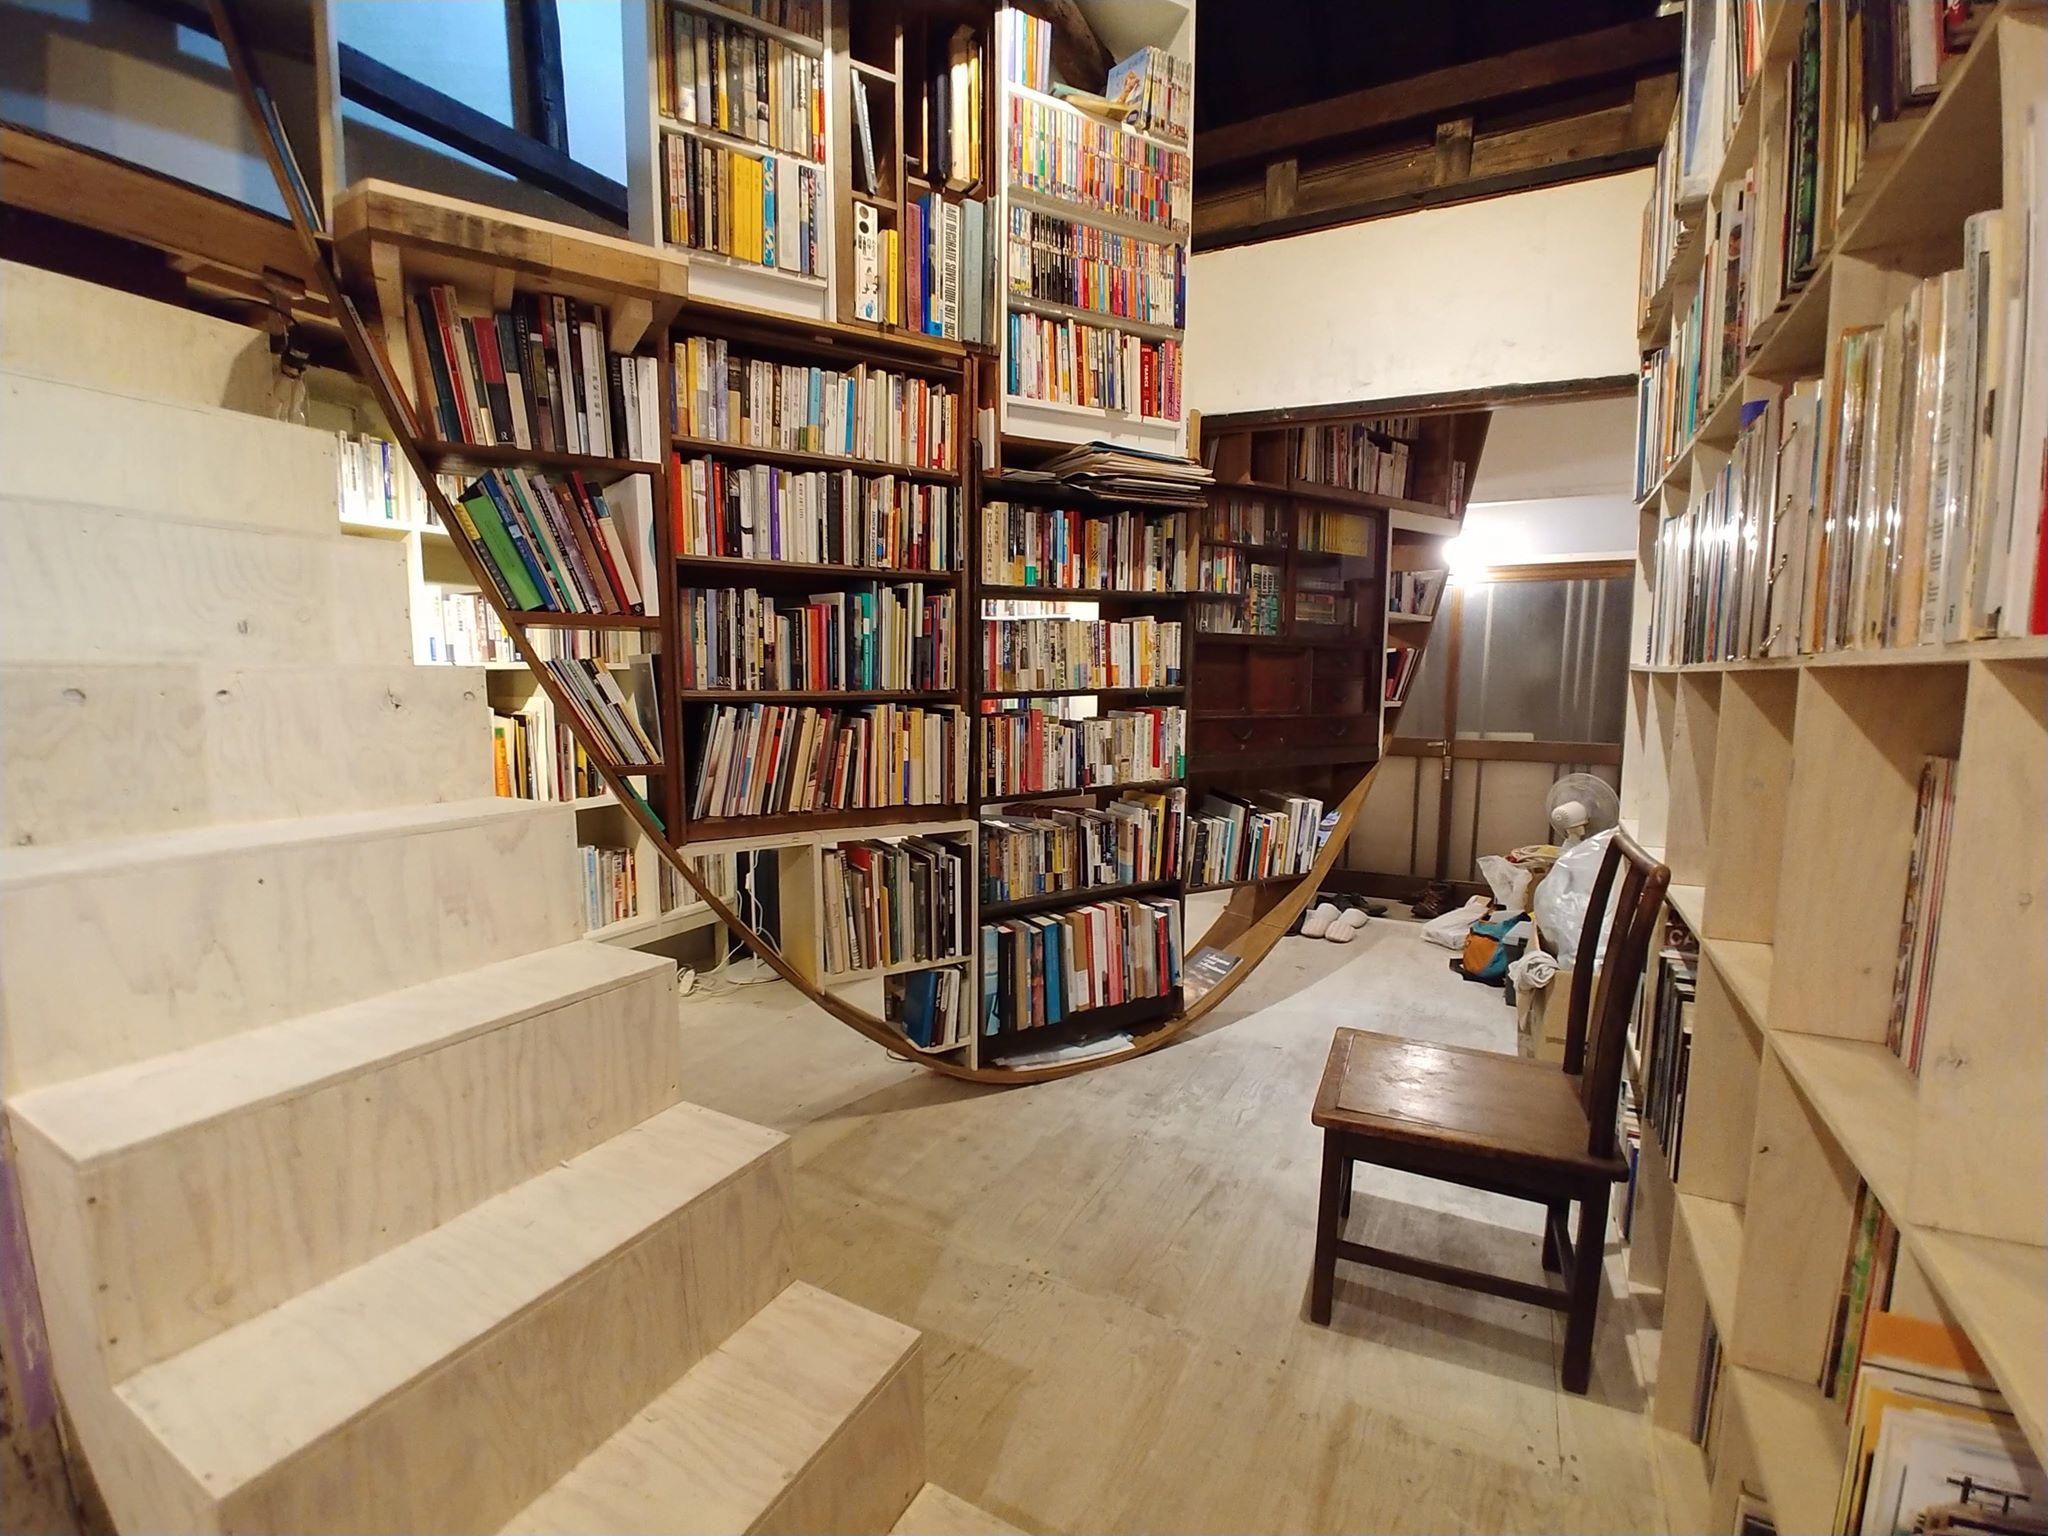 民泊図書館KAB Library and Residency_d0058440_12232898.jpg